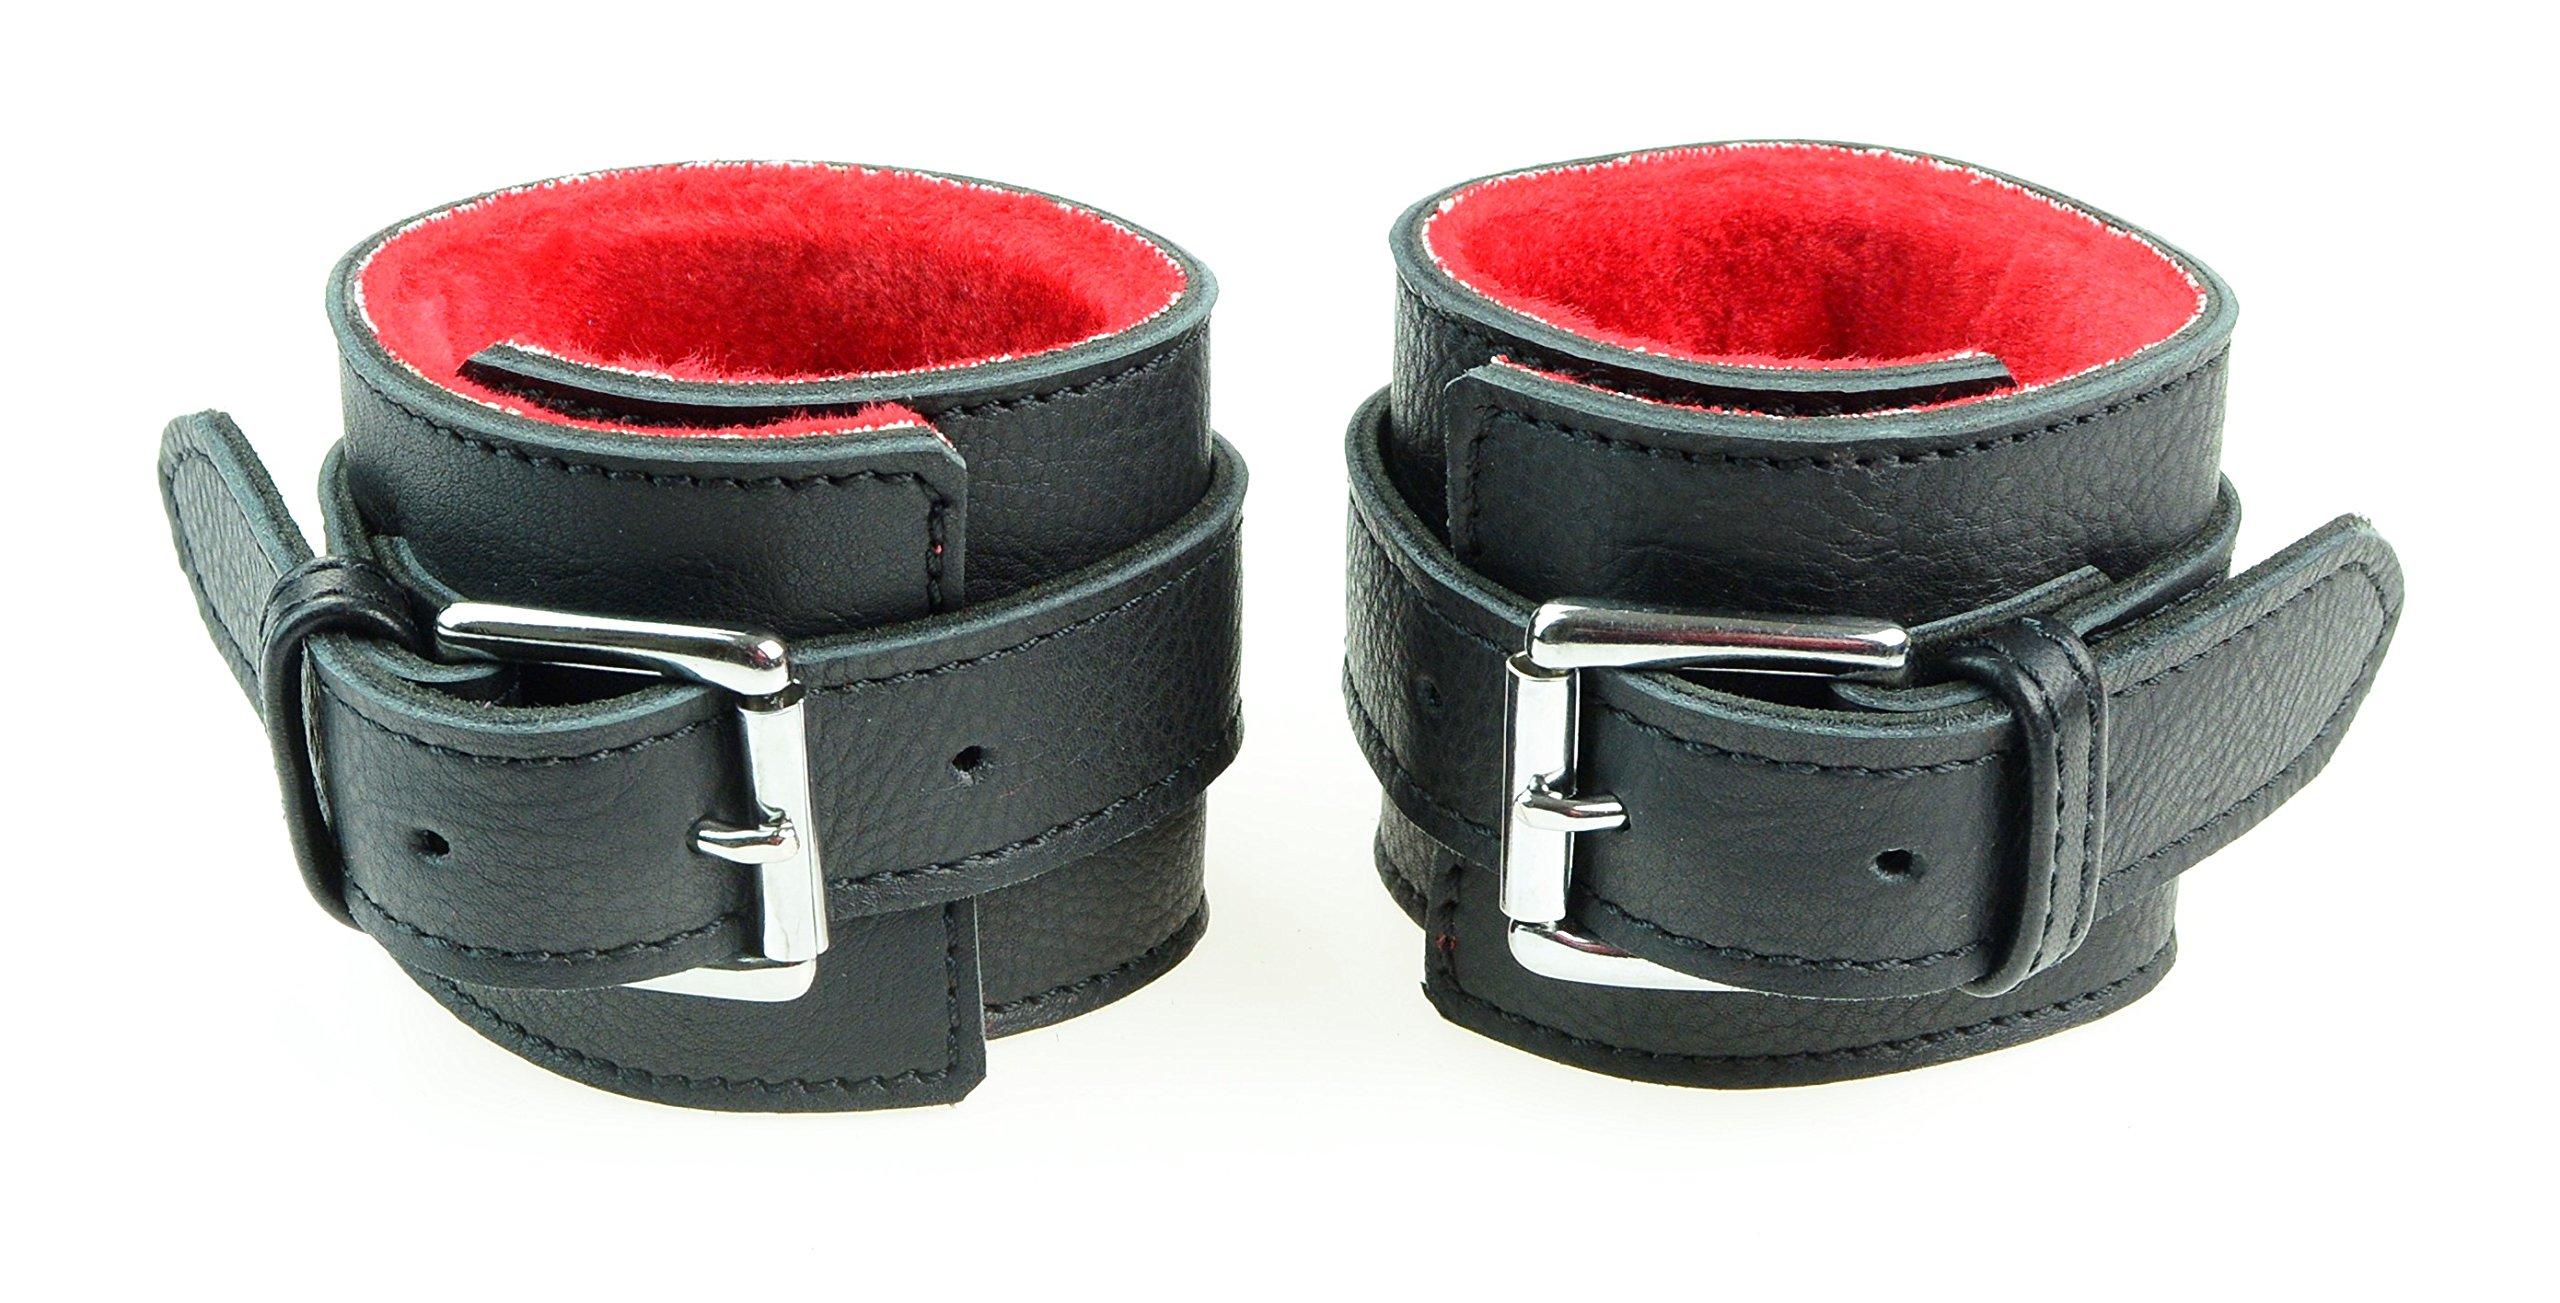 Plesur Top grain Genuine Leather Wrist Cuffs Leather Bracelets Handcuffs with faux fur lining